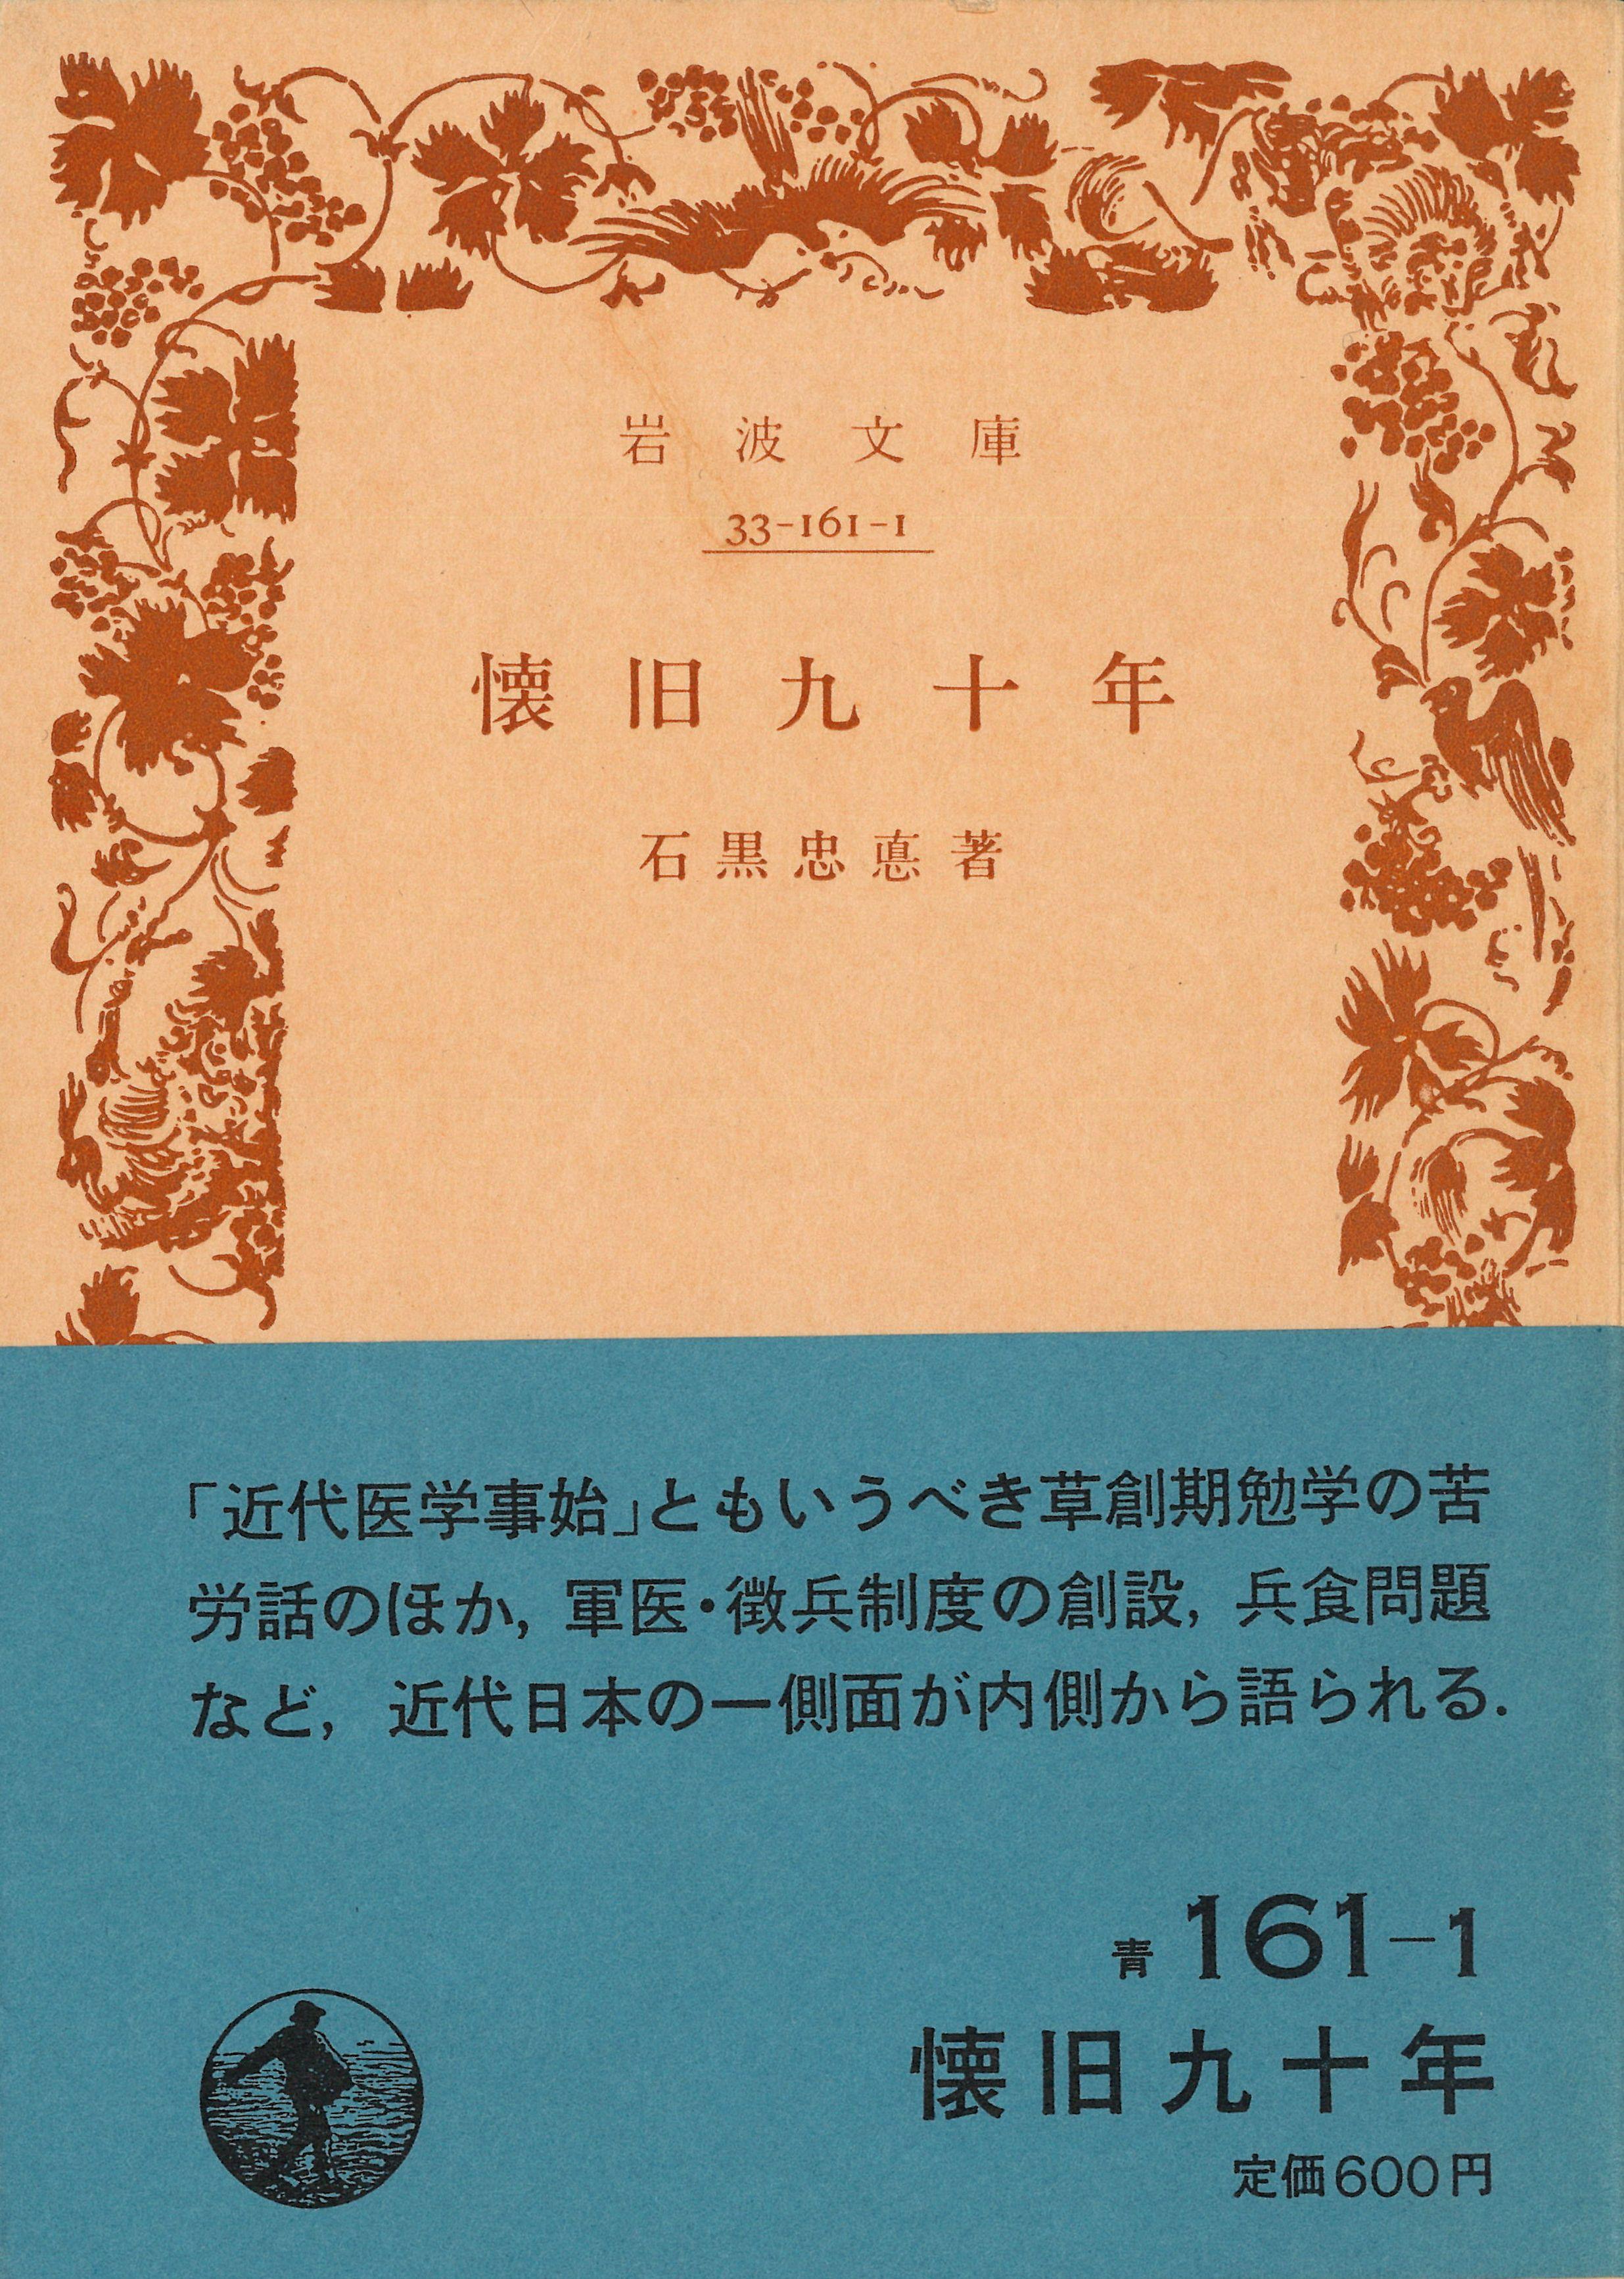 20170201133731_00001